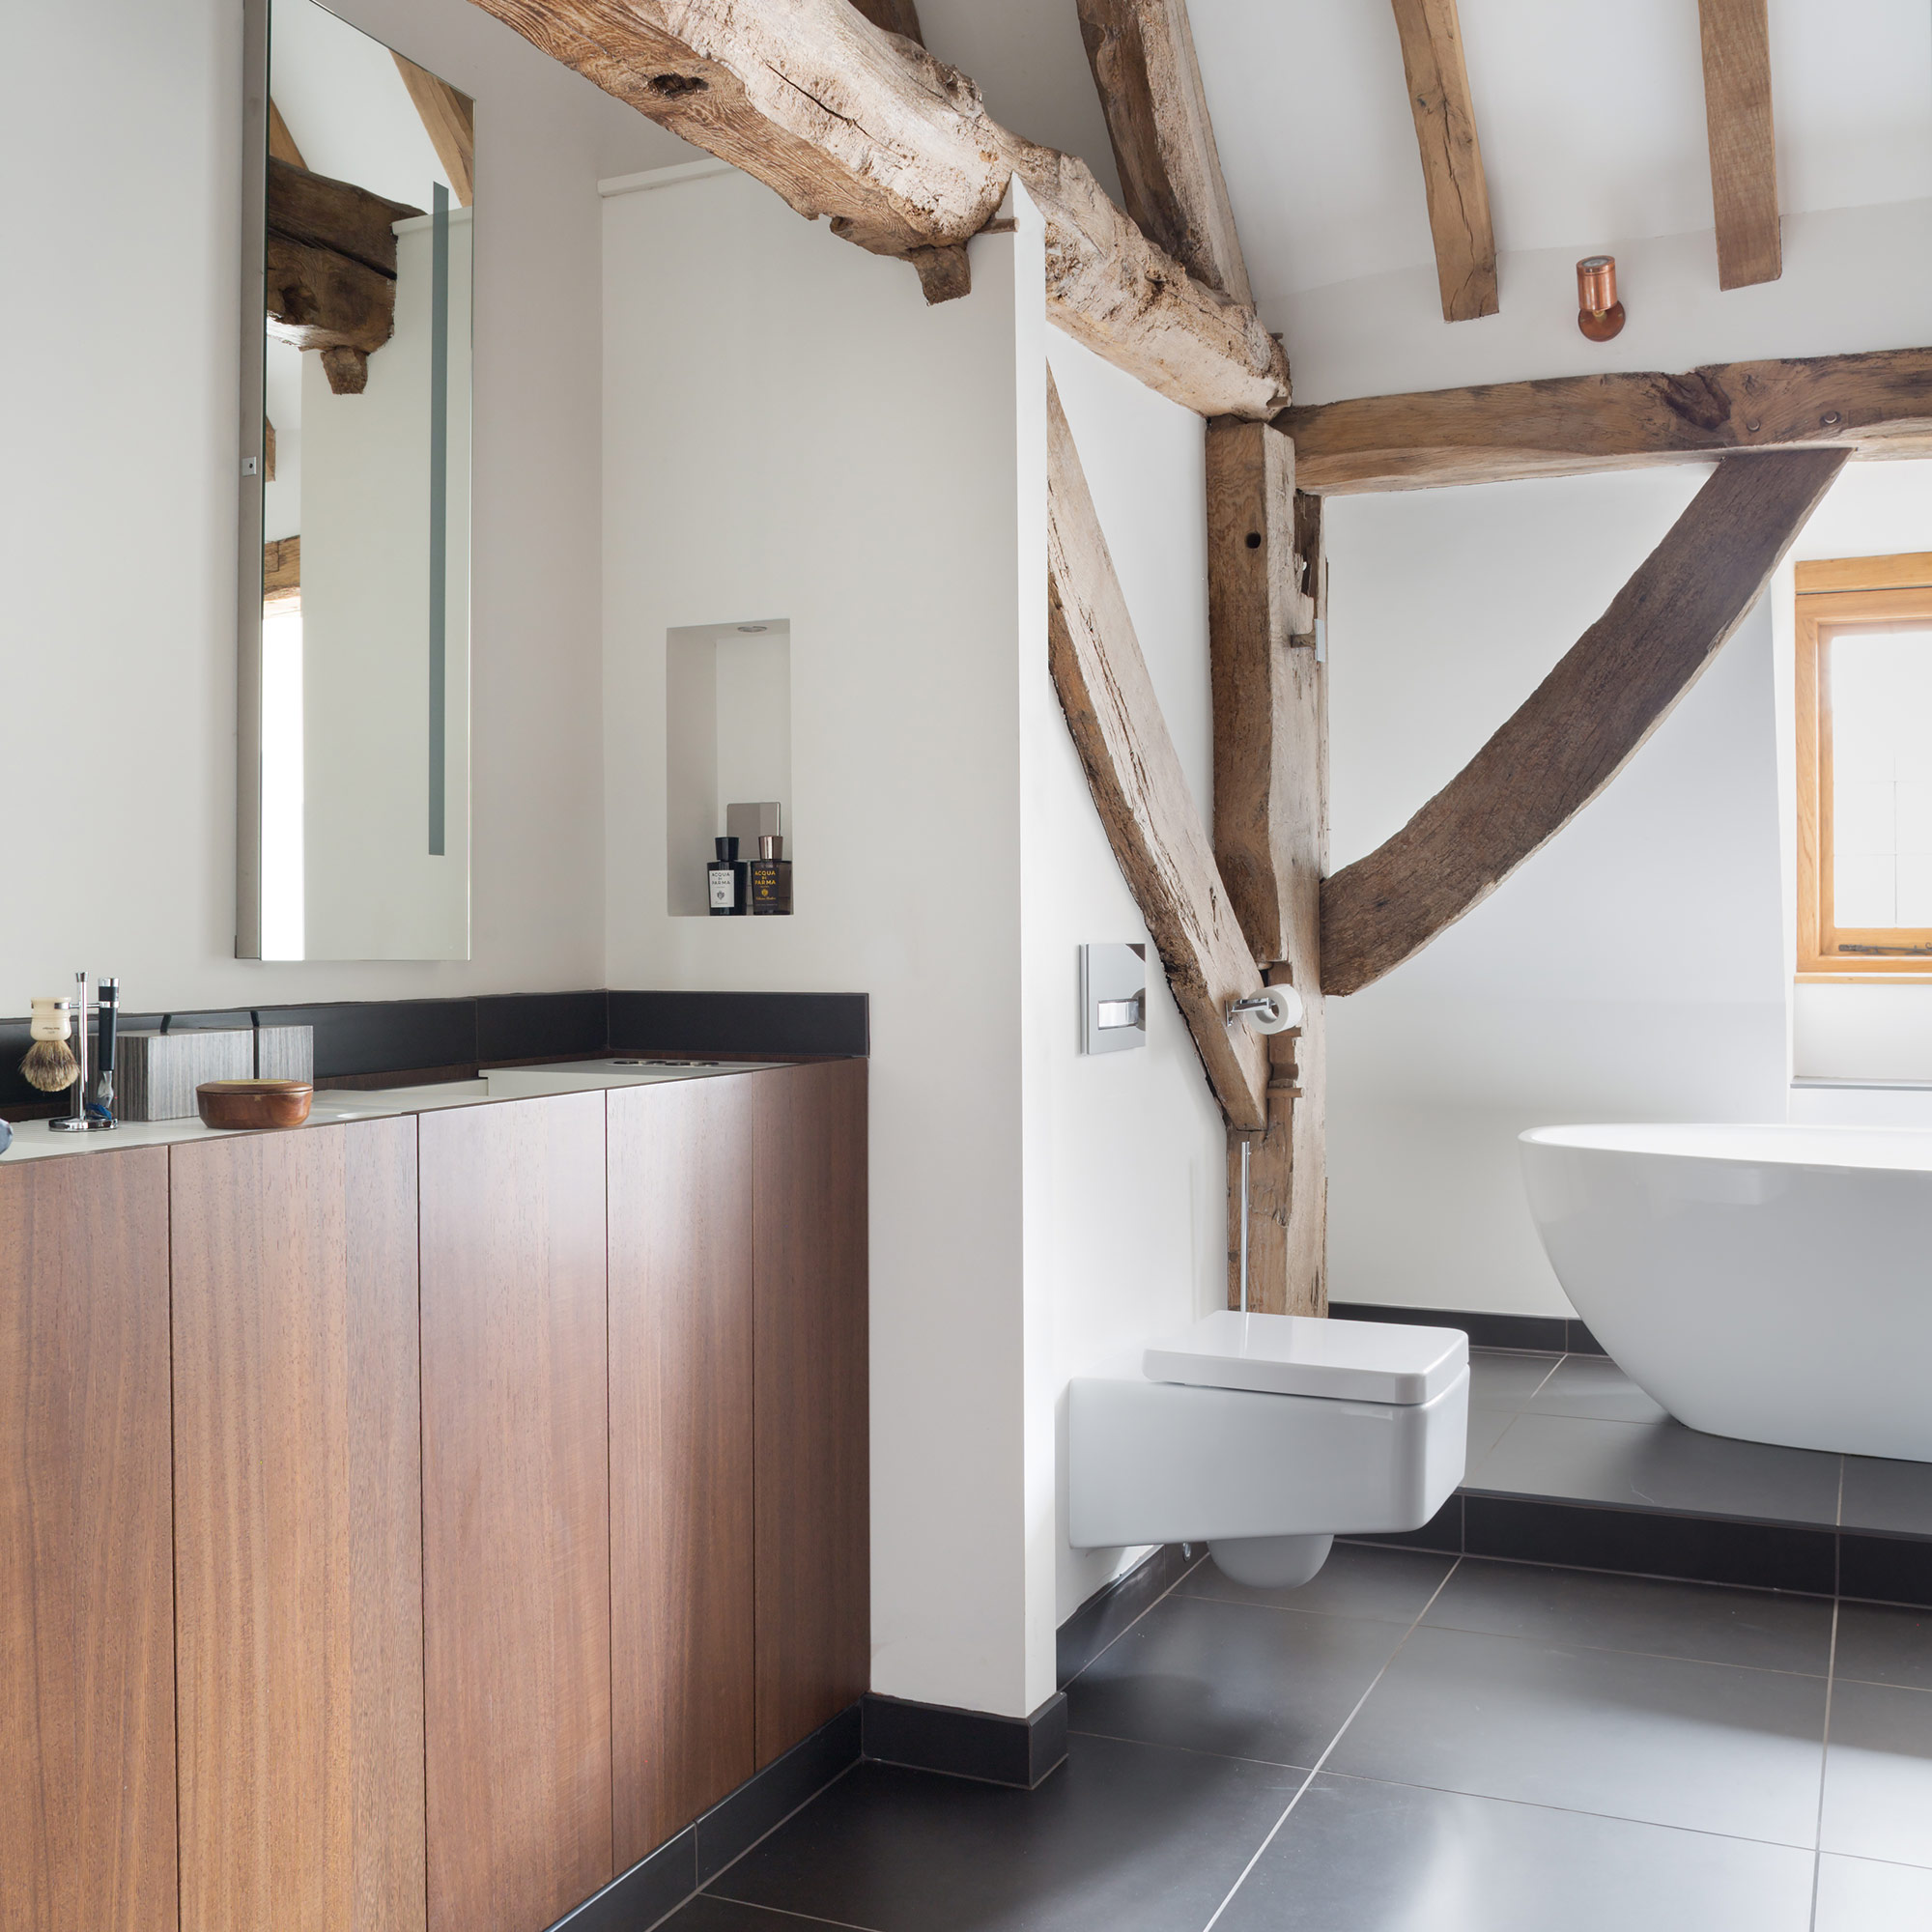 West One Bathrooms Case Studies Sussex His Feat